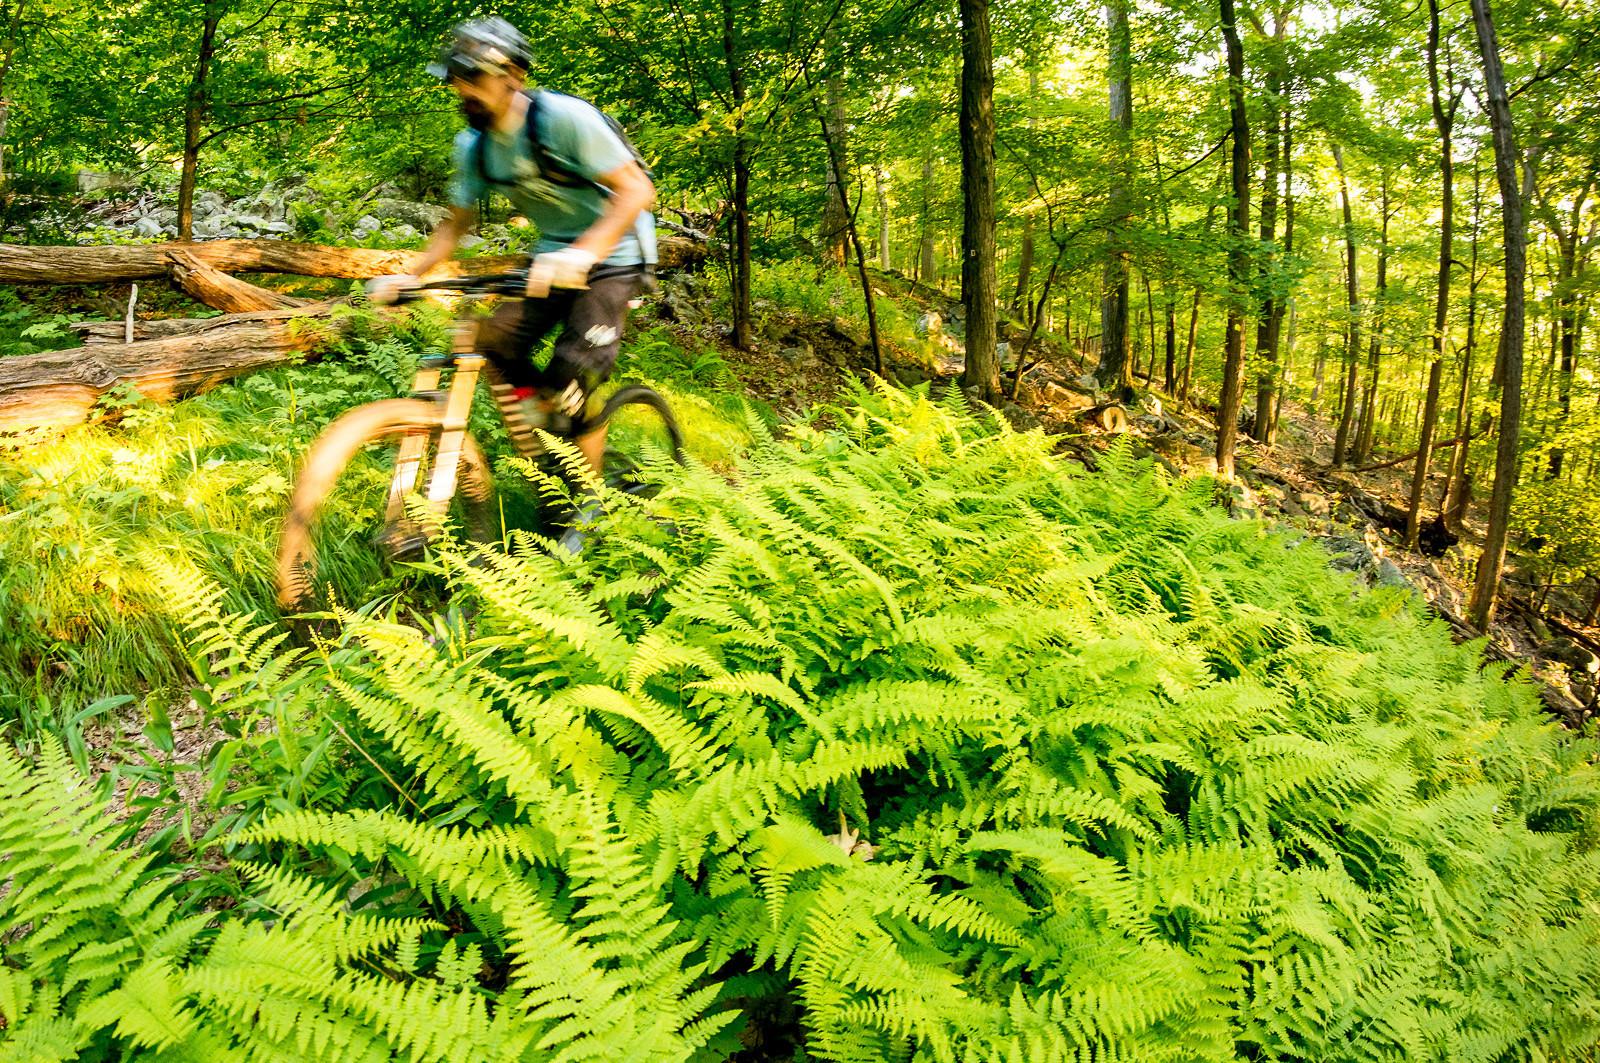 Ferns - jparker - Mountain Biking Pictures - Vital MTB